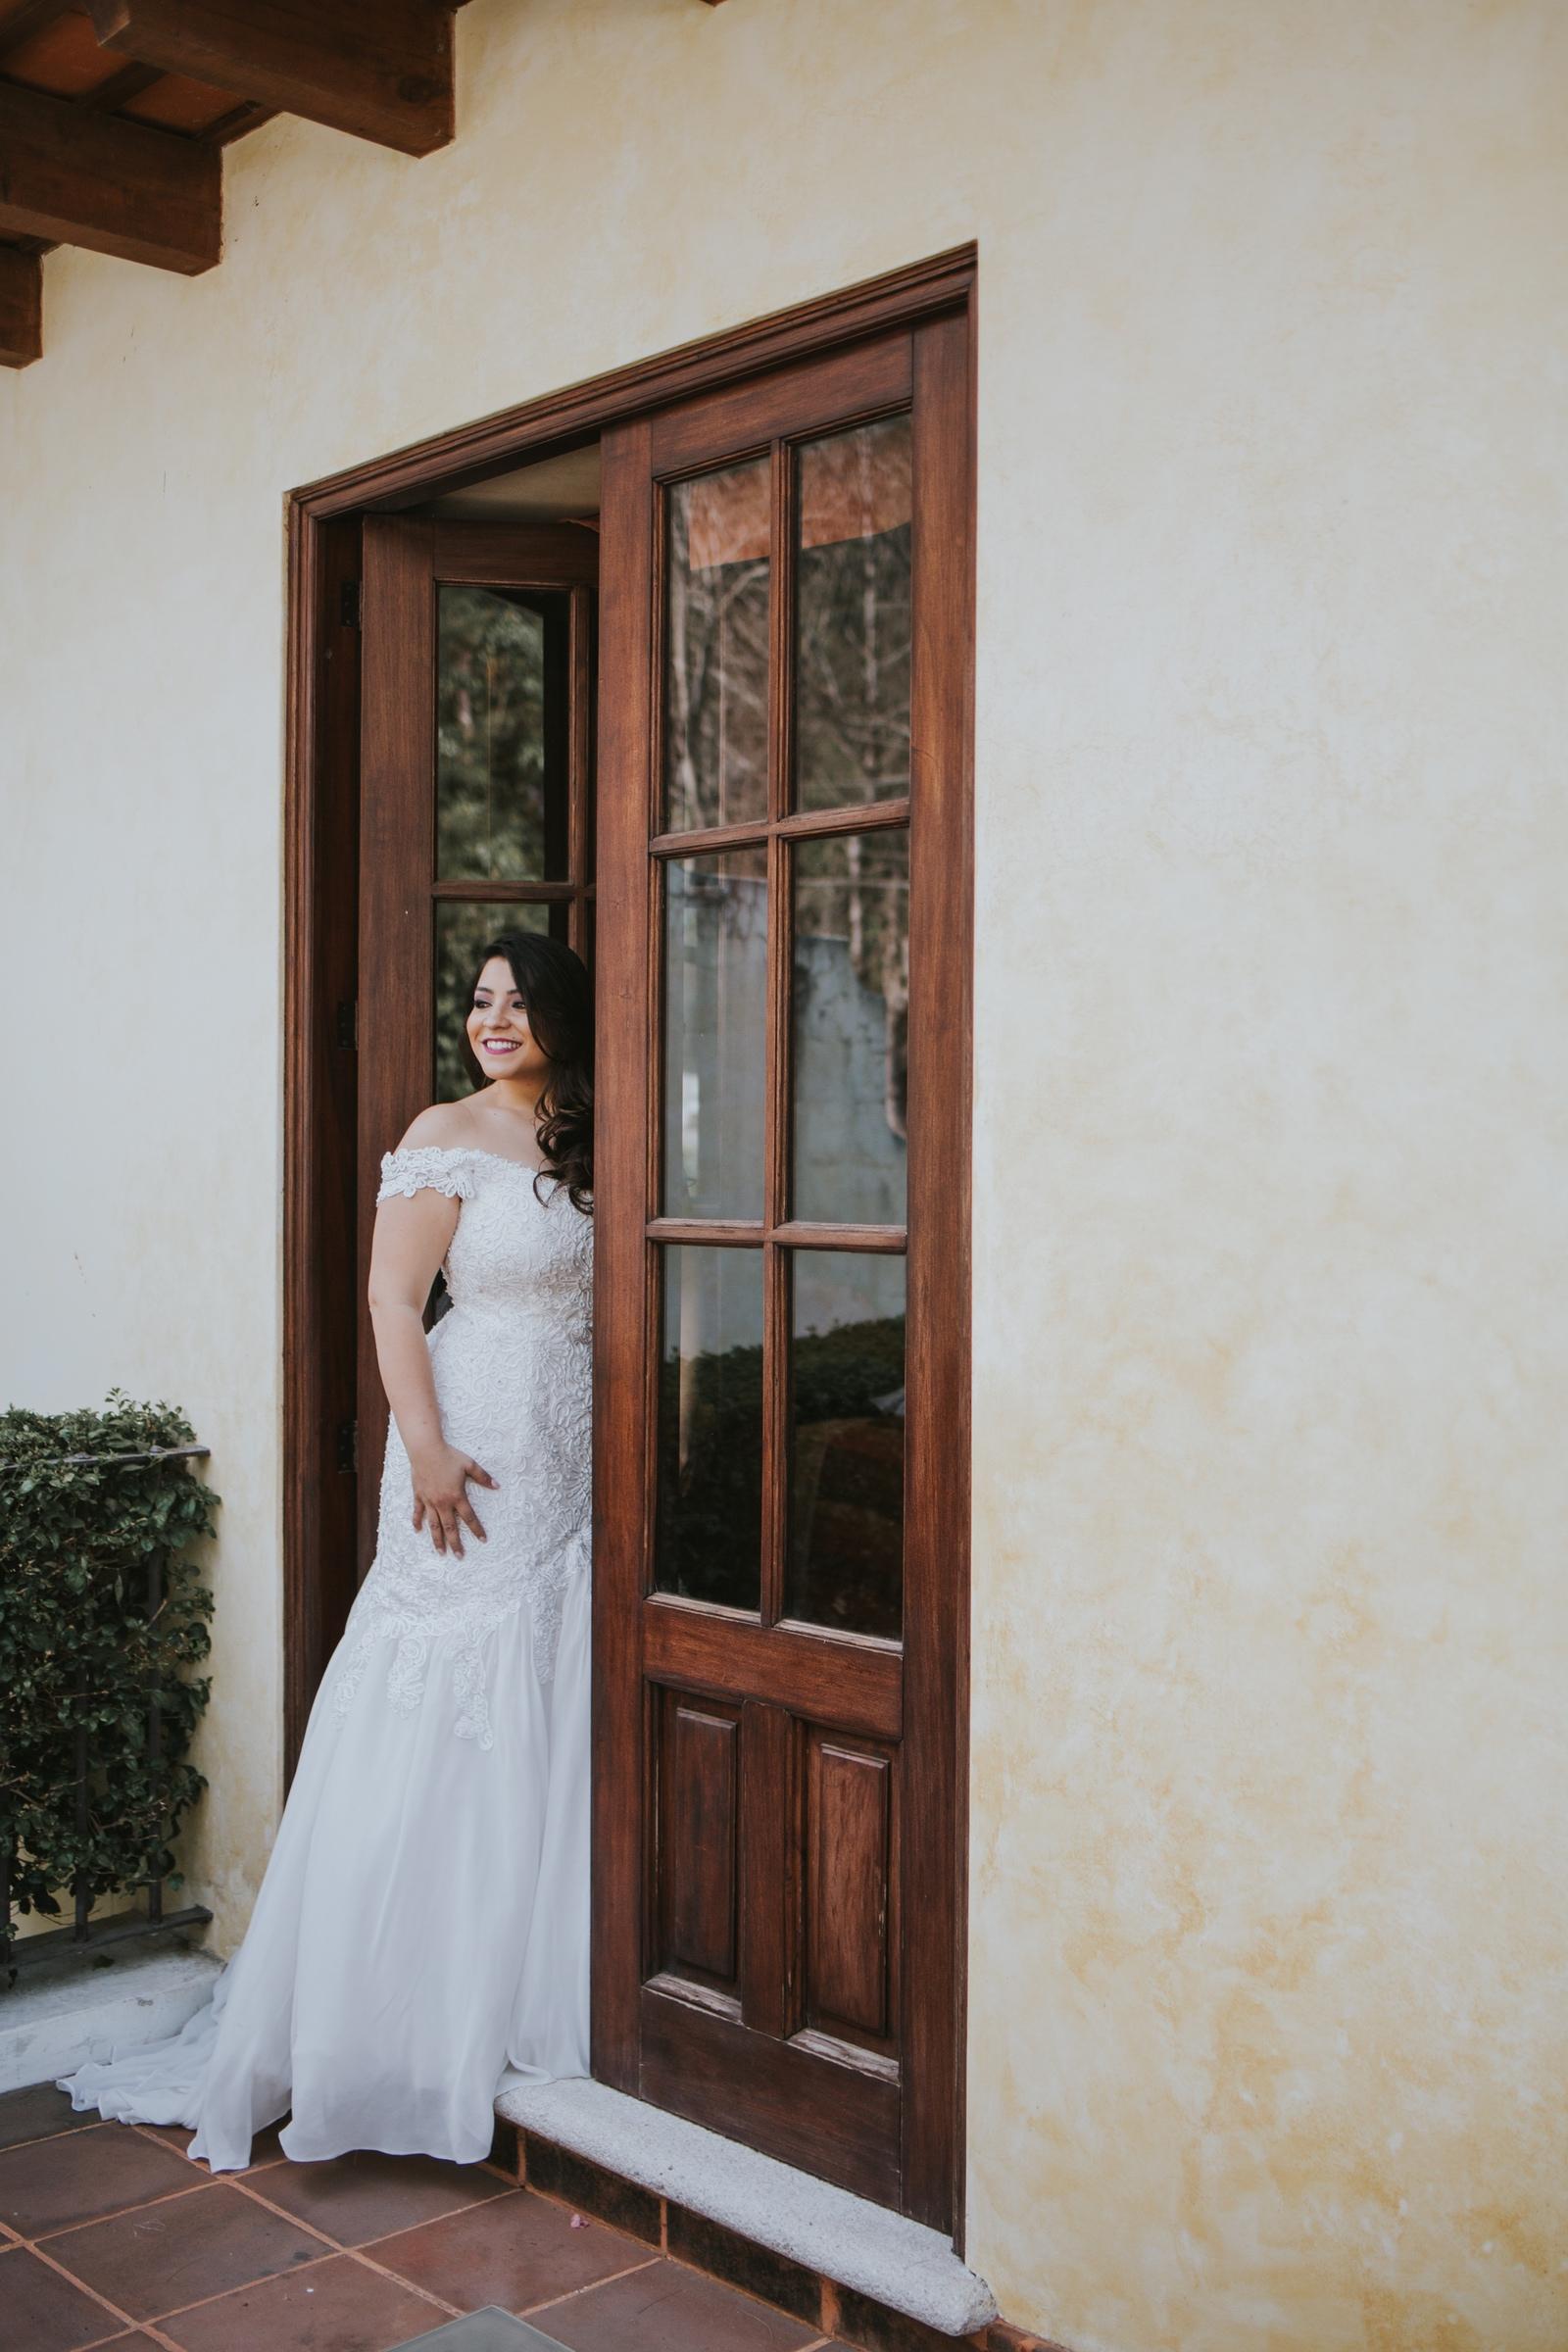 Le Cape Weddings - Creatives in Guatemala - Paulina and JP-7.jpg